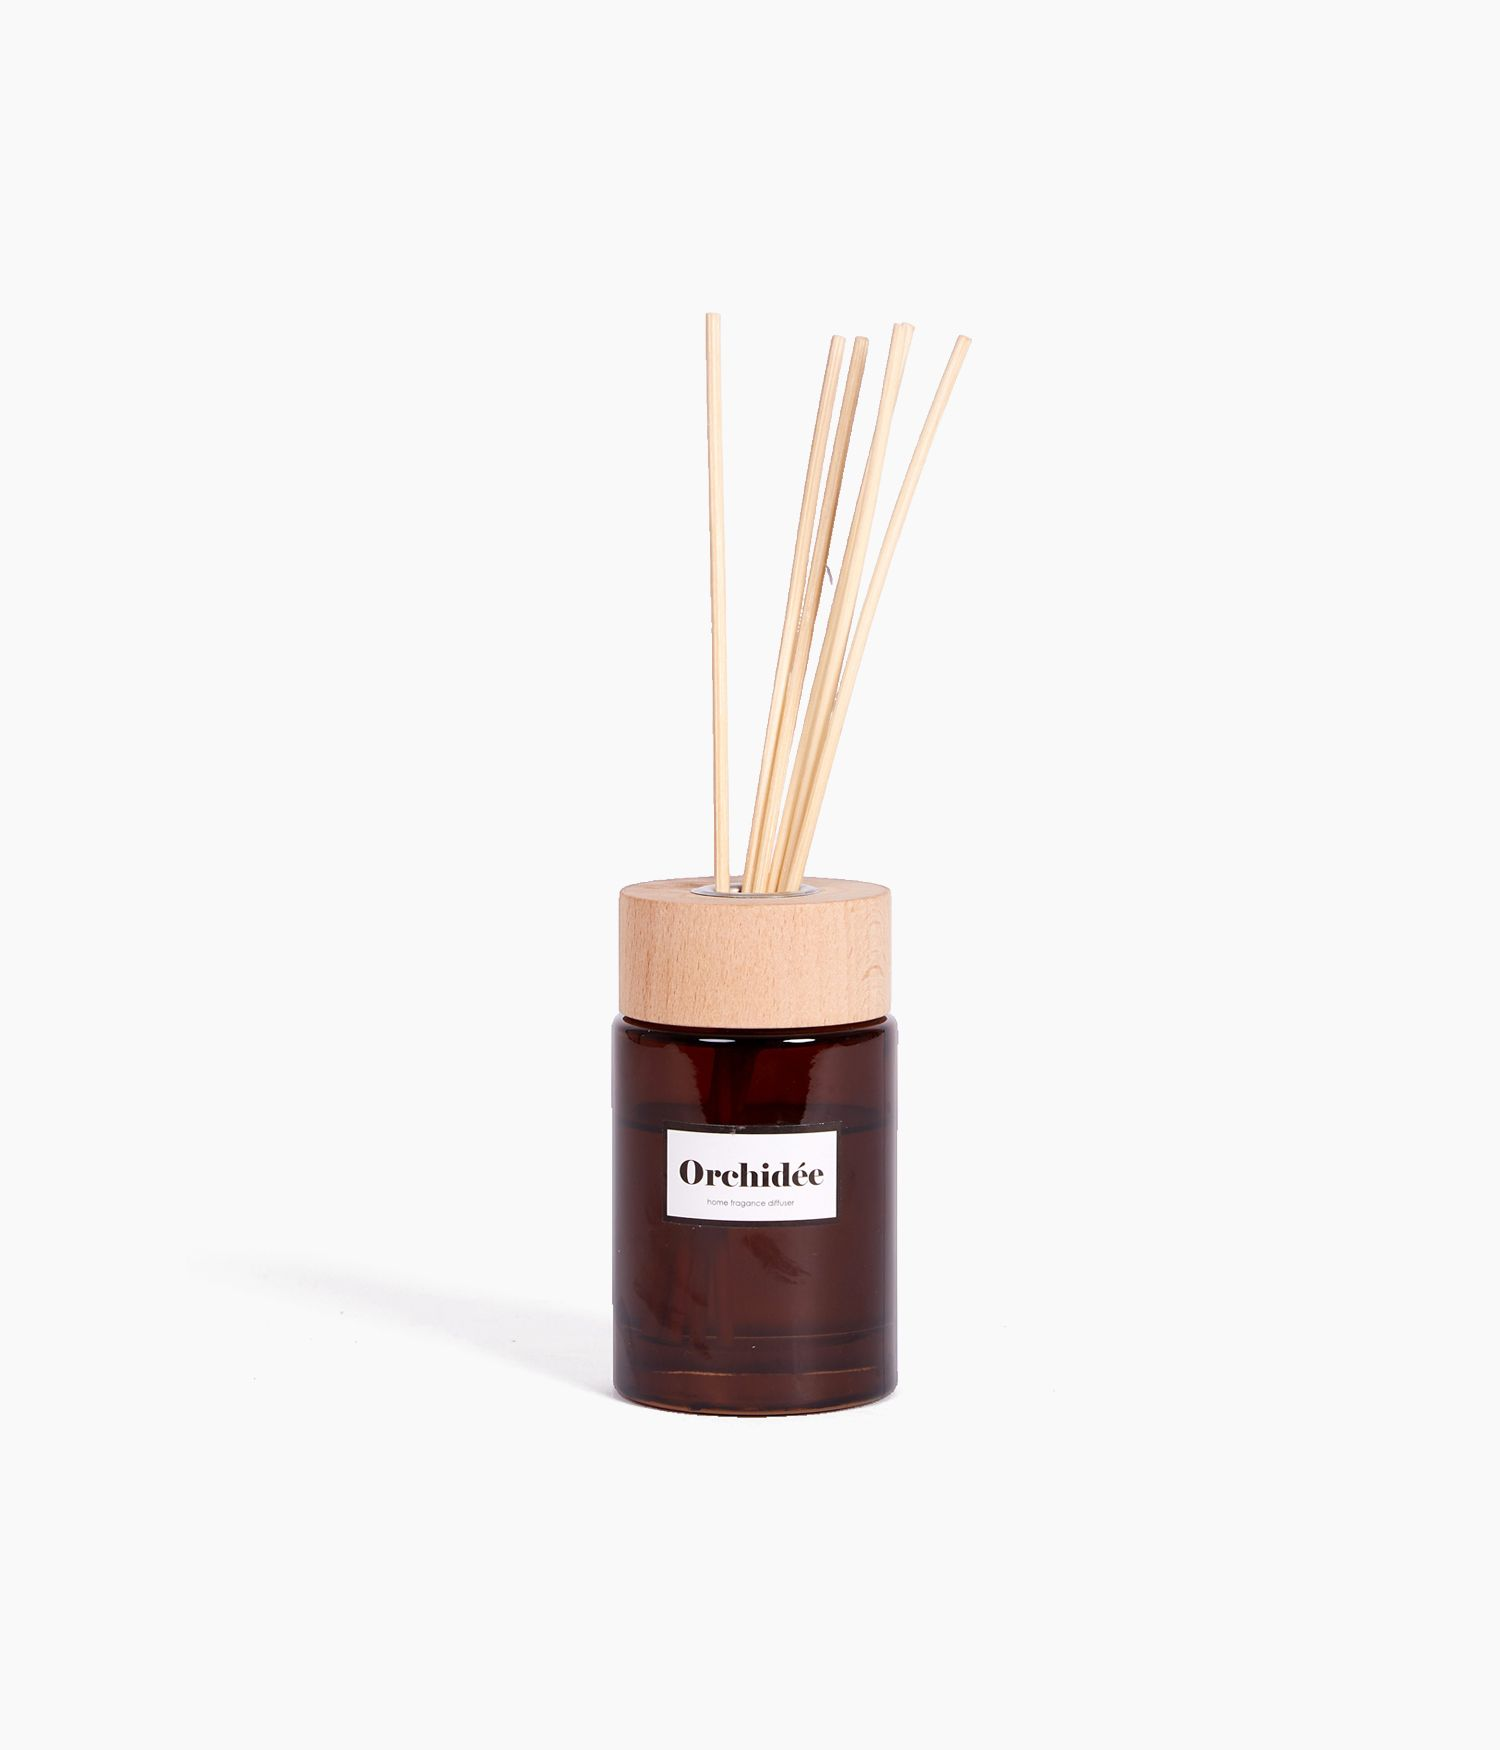 BOITE DE MOUCHOIRS - Bambou